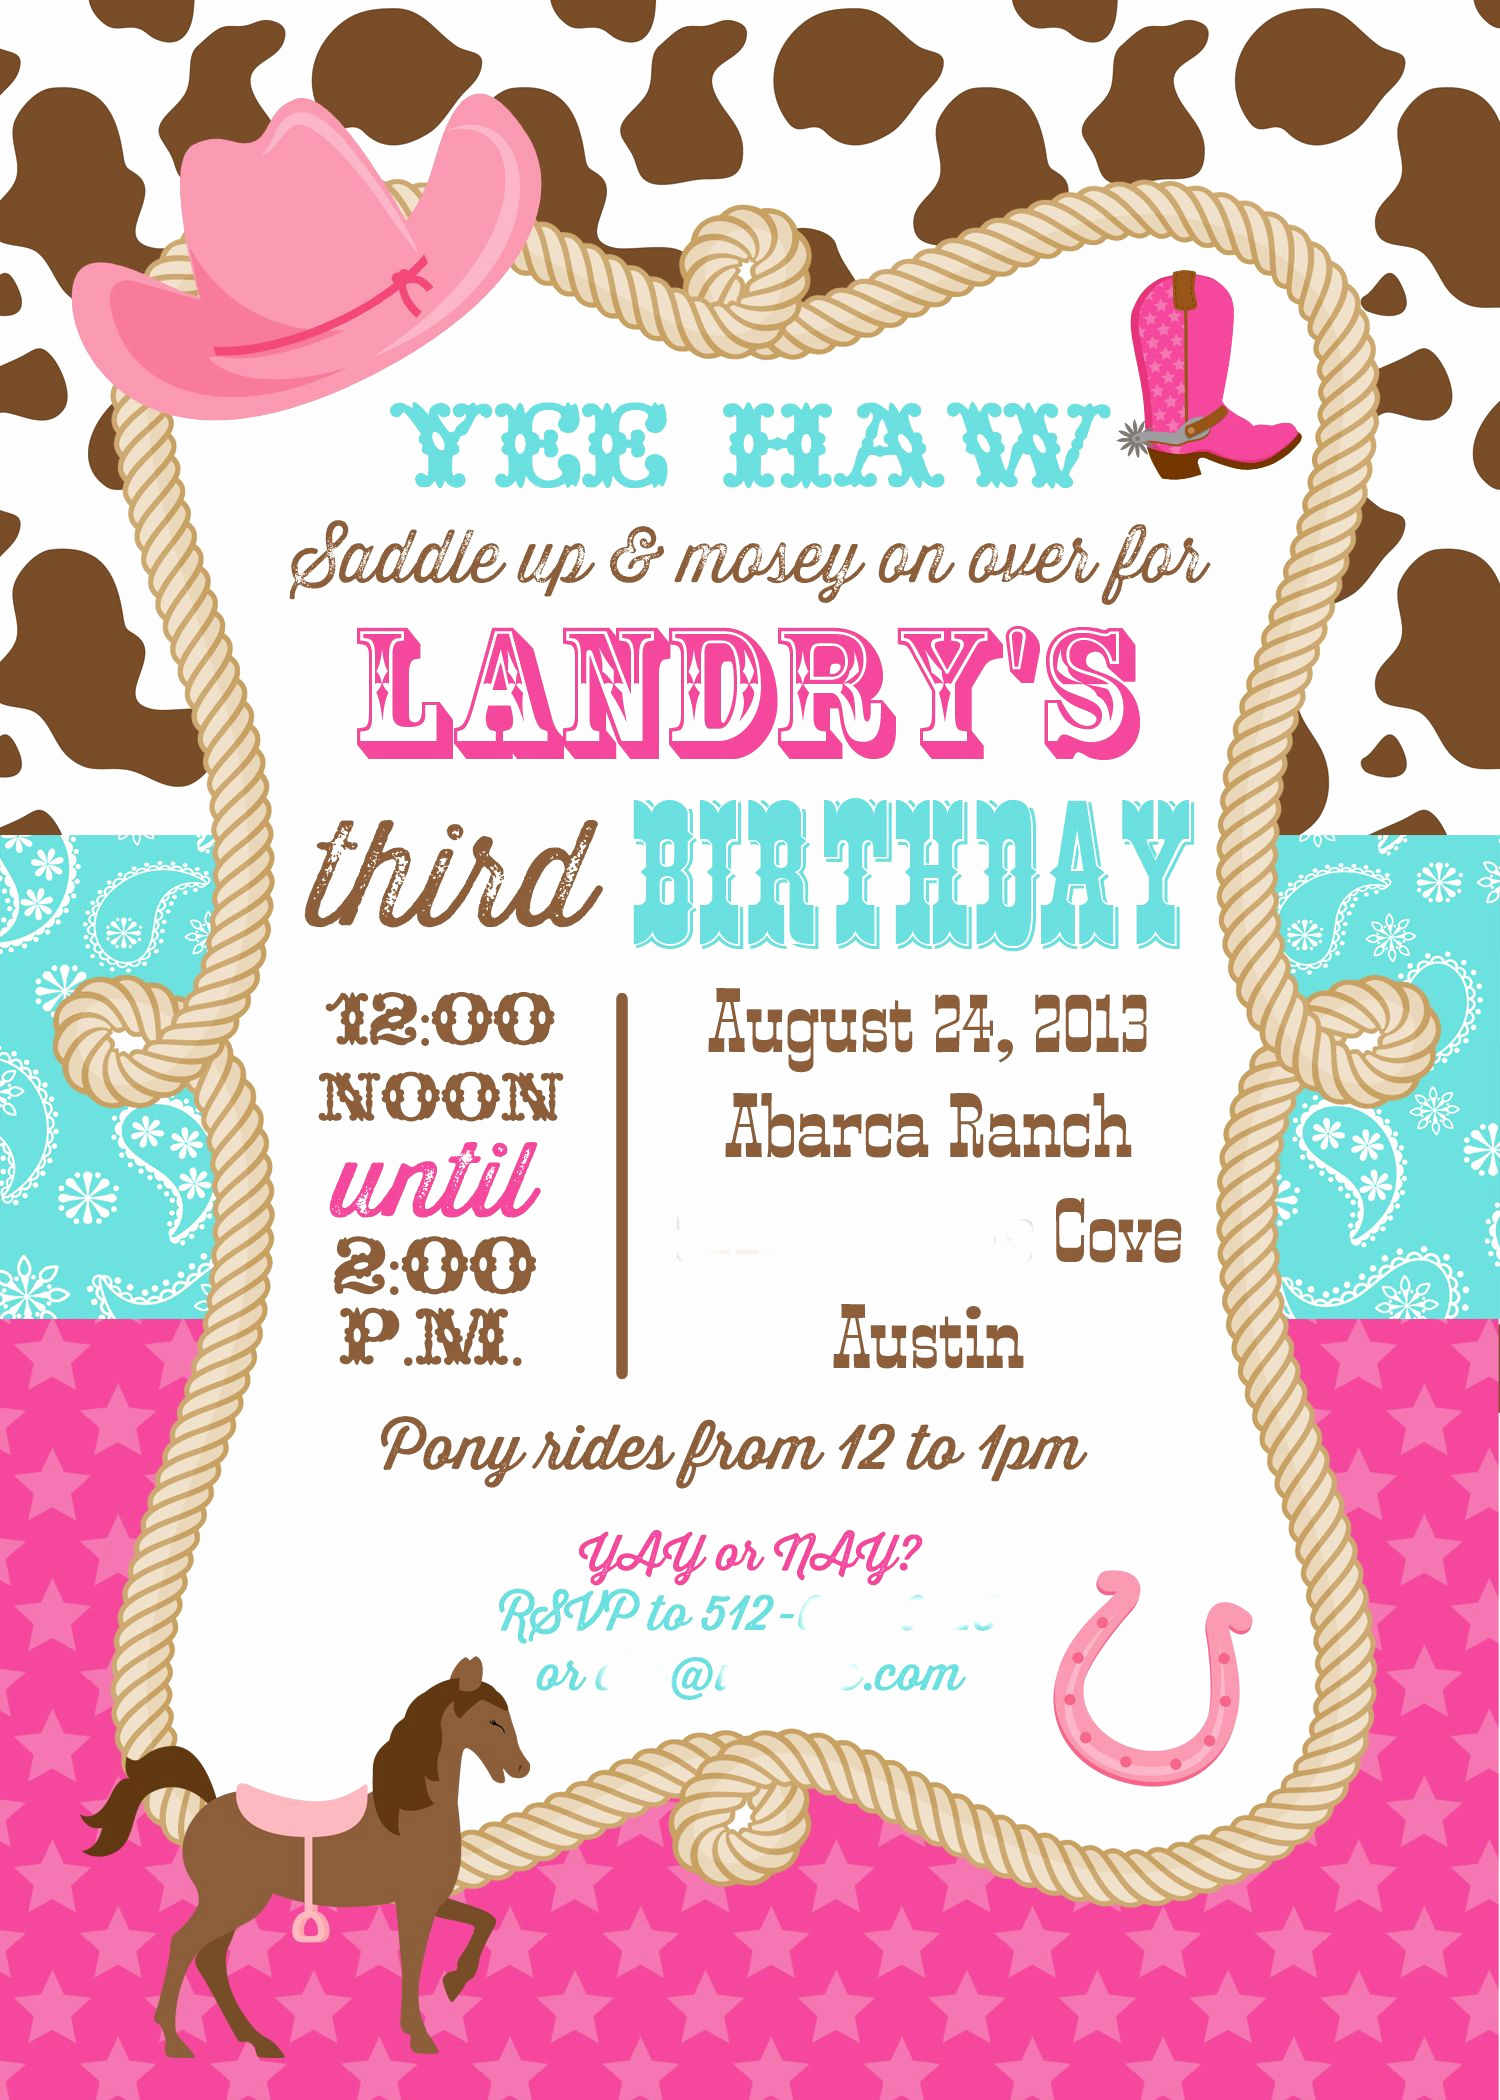 3rd Birthday Invitation Wording Beautiful 3rd Birthday Invite Address Removed1 1 500×2 100